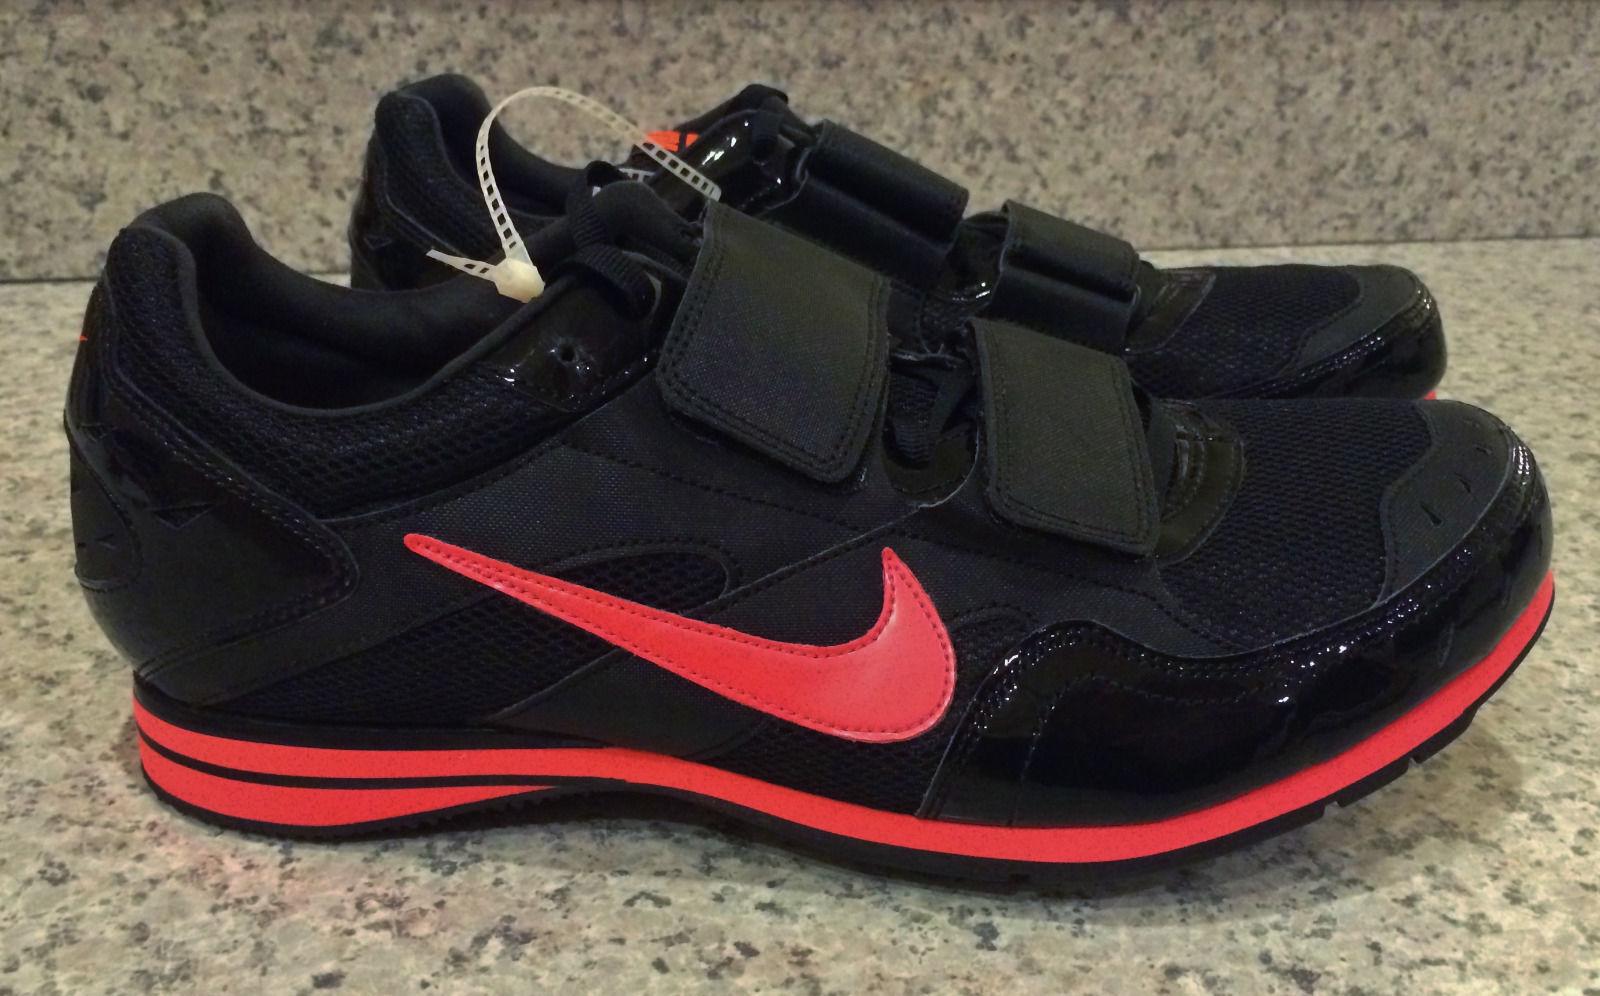 NIKE ZOOM TJ 3 Black Atomic Red Triple Jump Track Spikes Shoes New Mens Sz 12 15